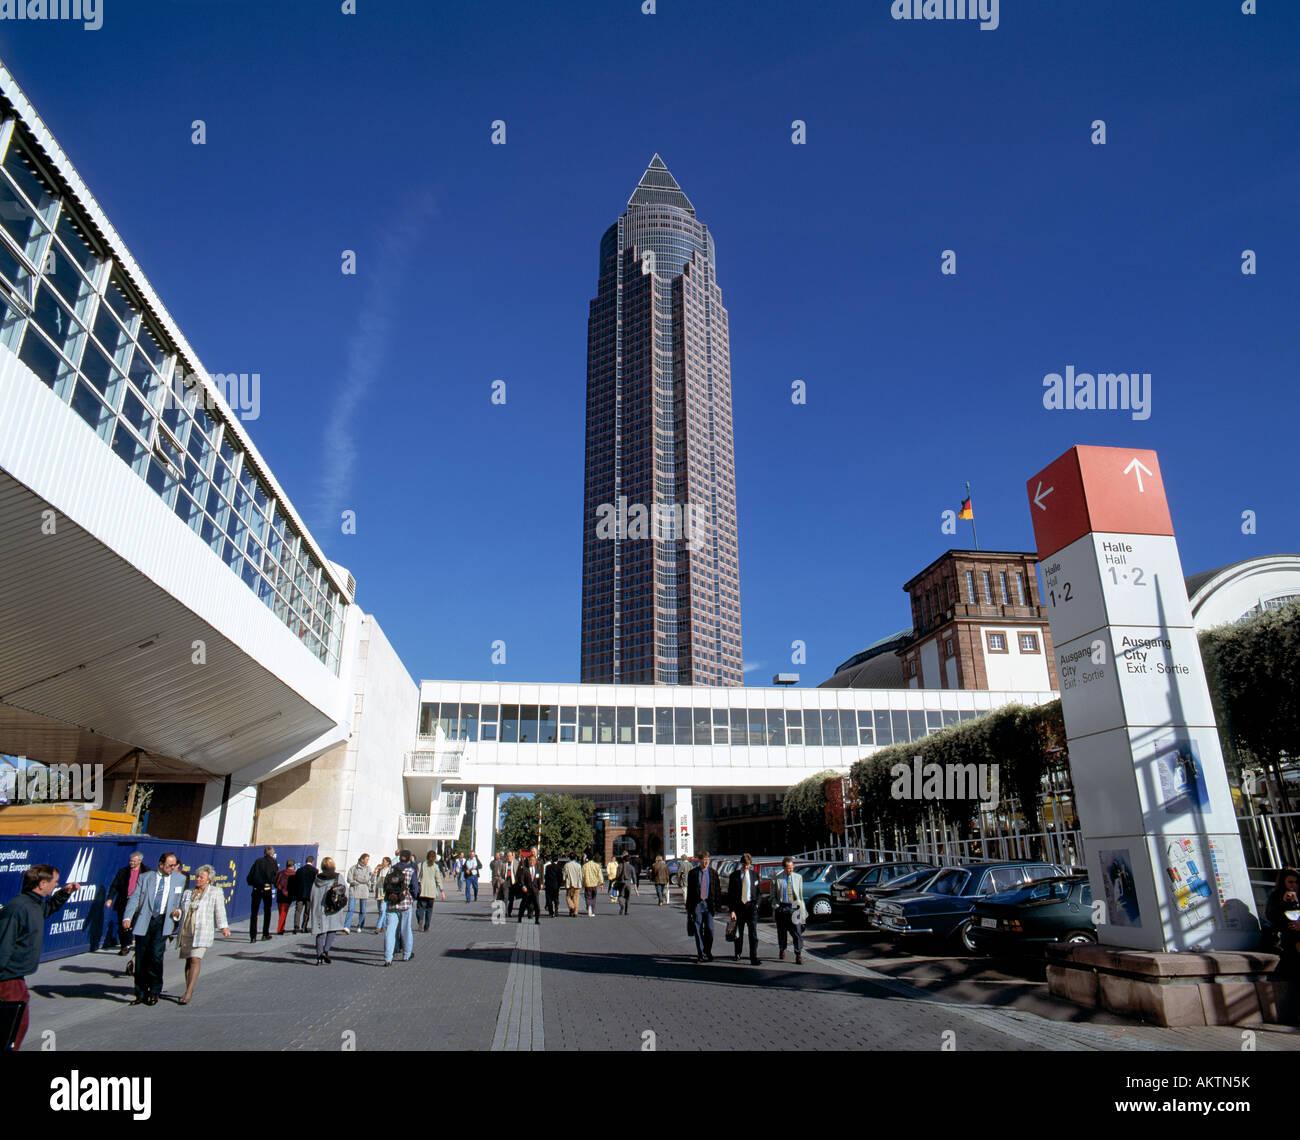 D-Frankfurt on the Main, Hesse, trade, fair, exhibition site during the Frankfurt Book Fair, Fair Tower, skyscraper, - Stock Image